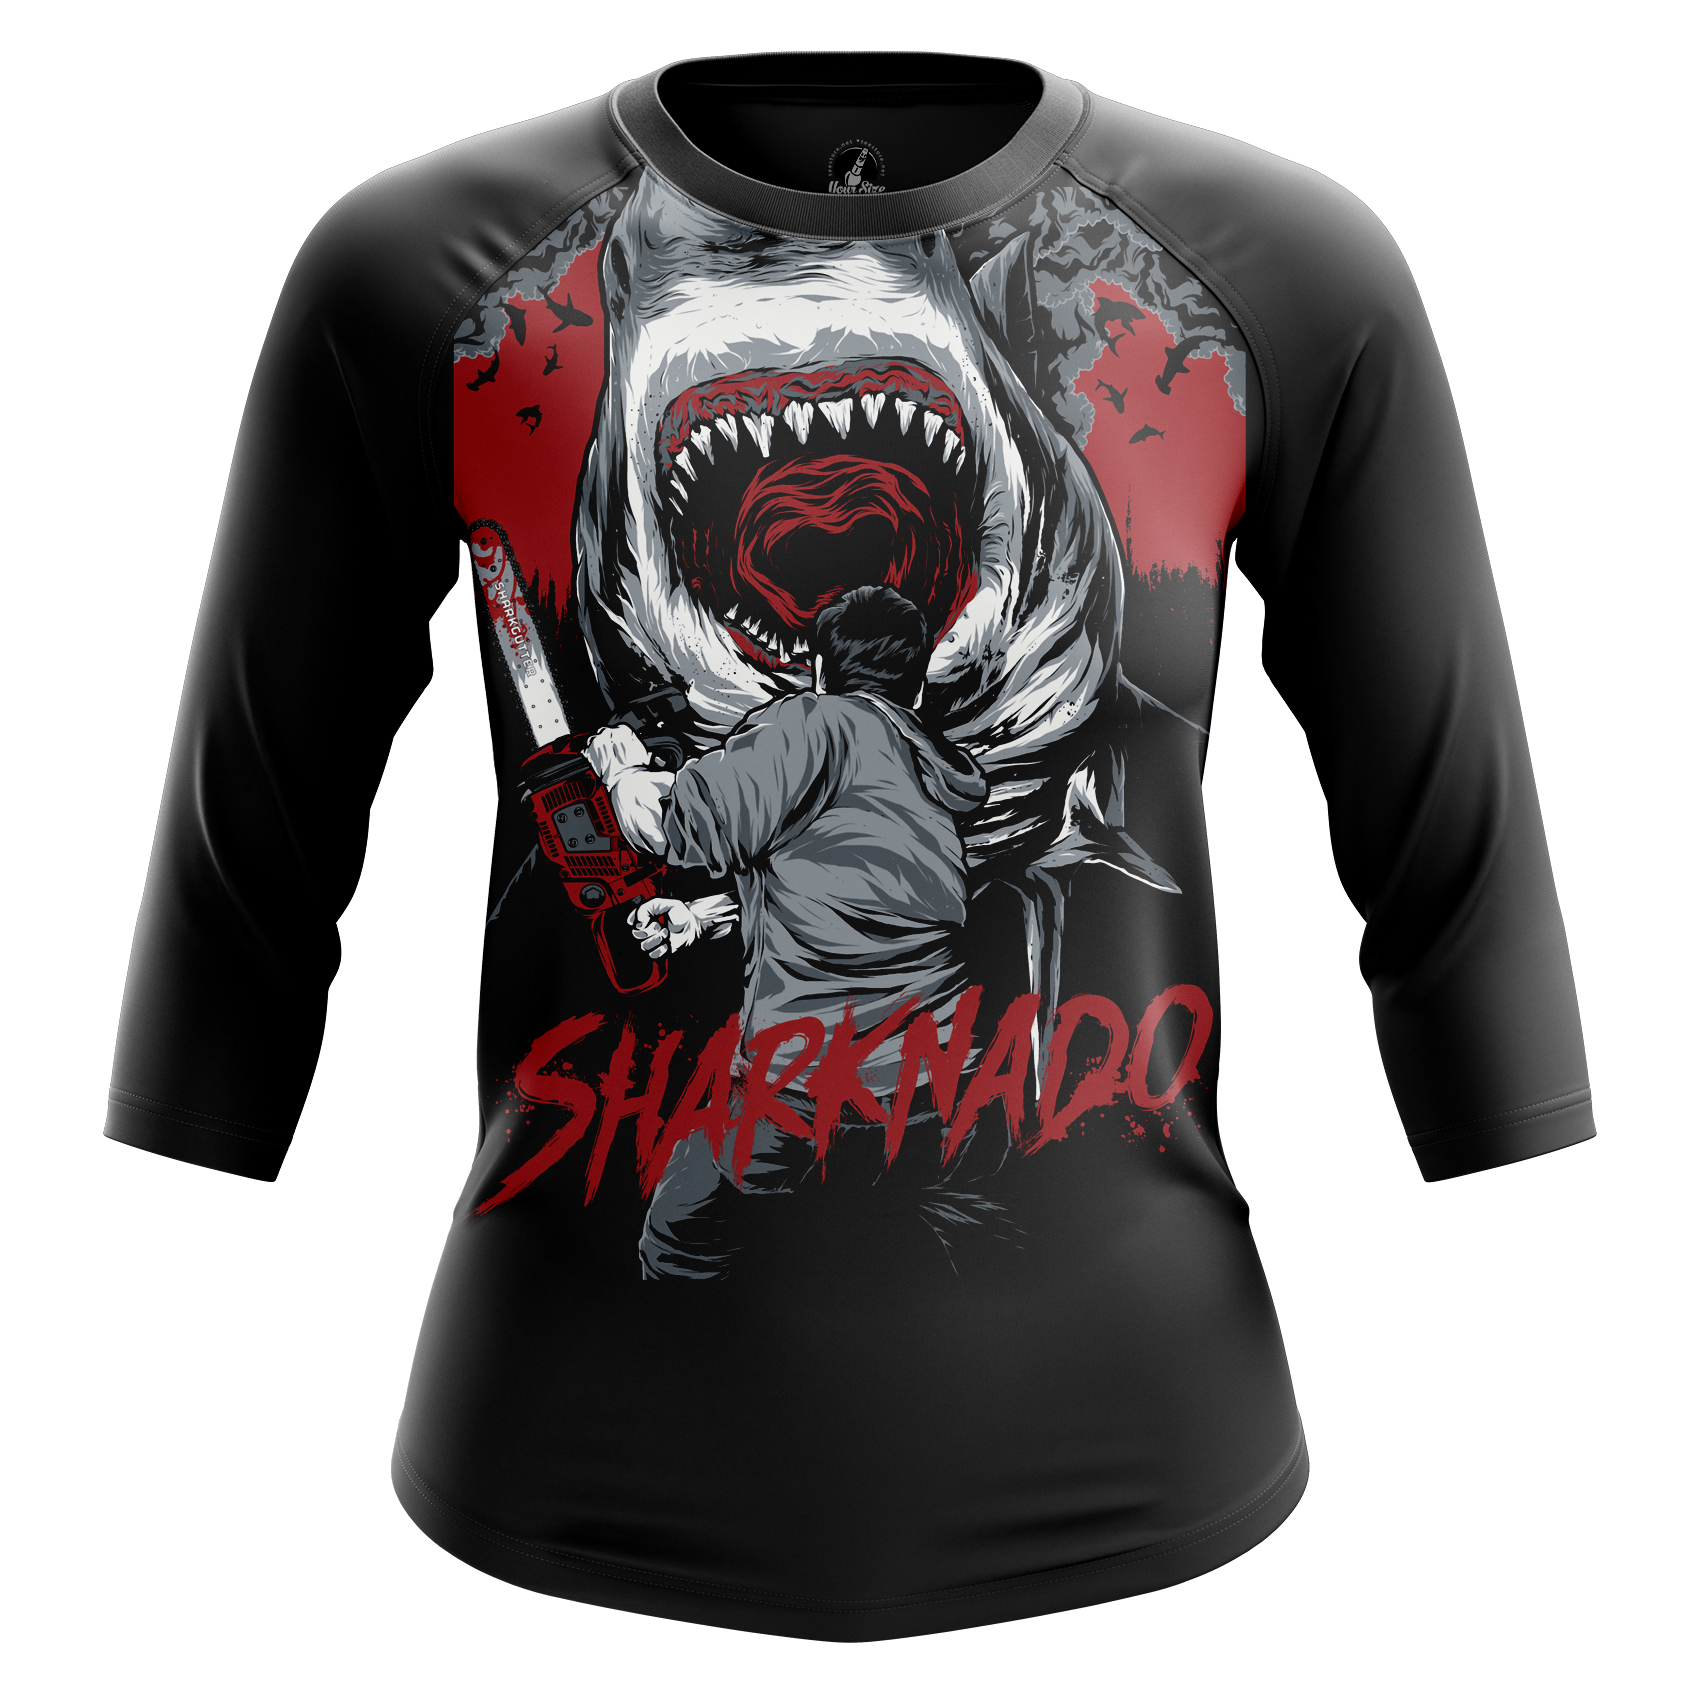 Collectibles Women'S Raglan Sharknado Jaws